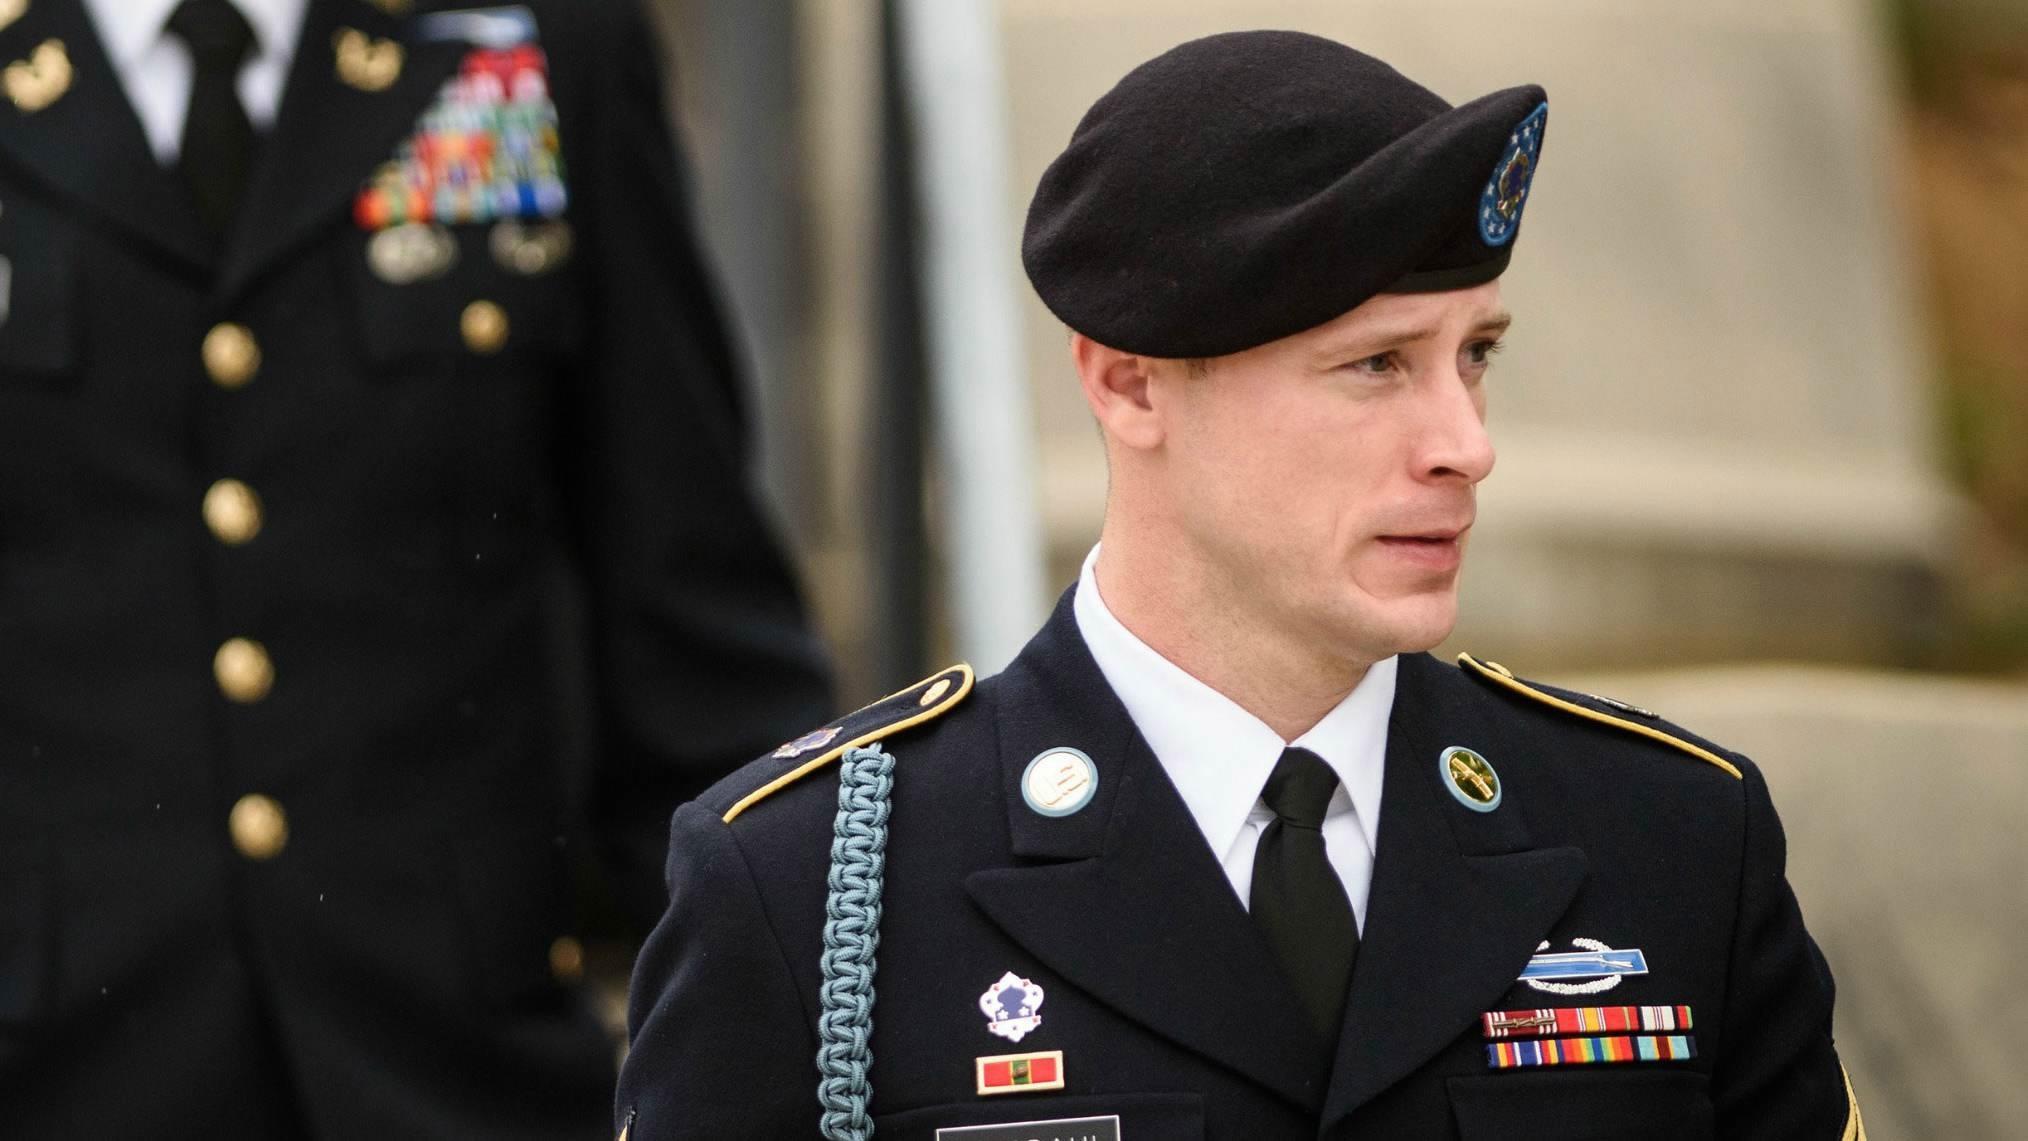 U.S. military deserter spared prison time